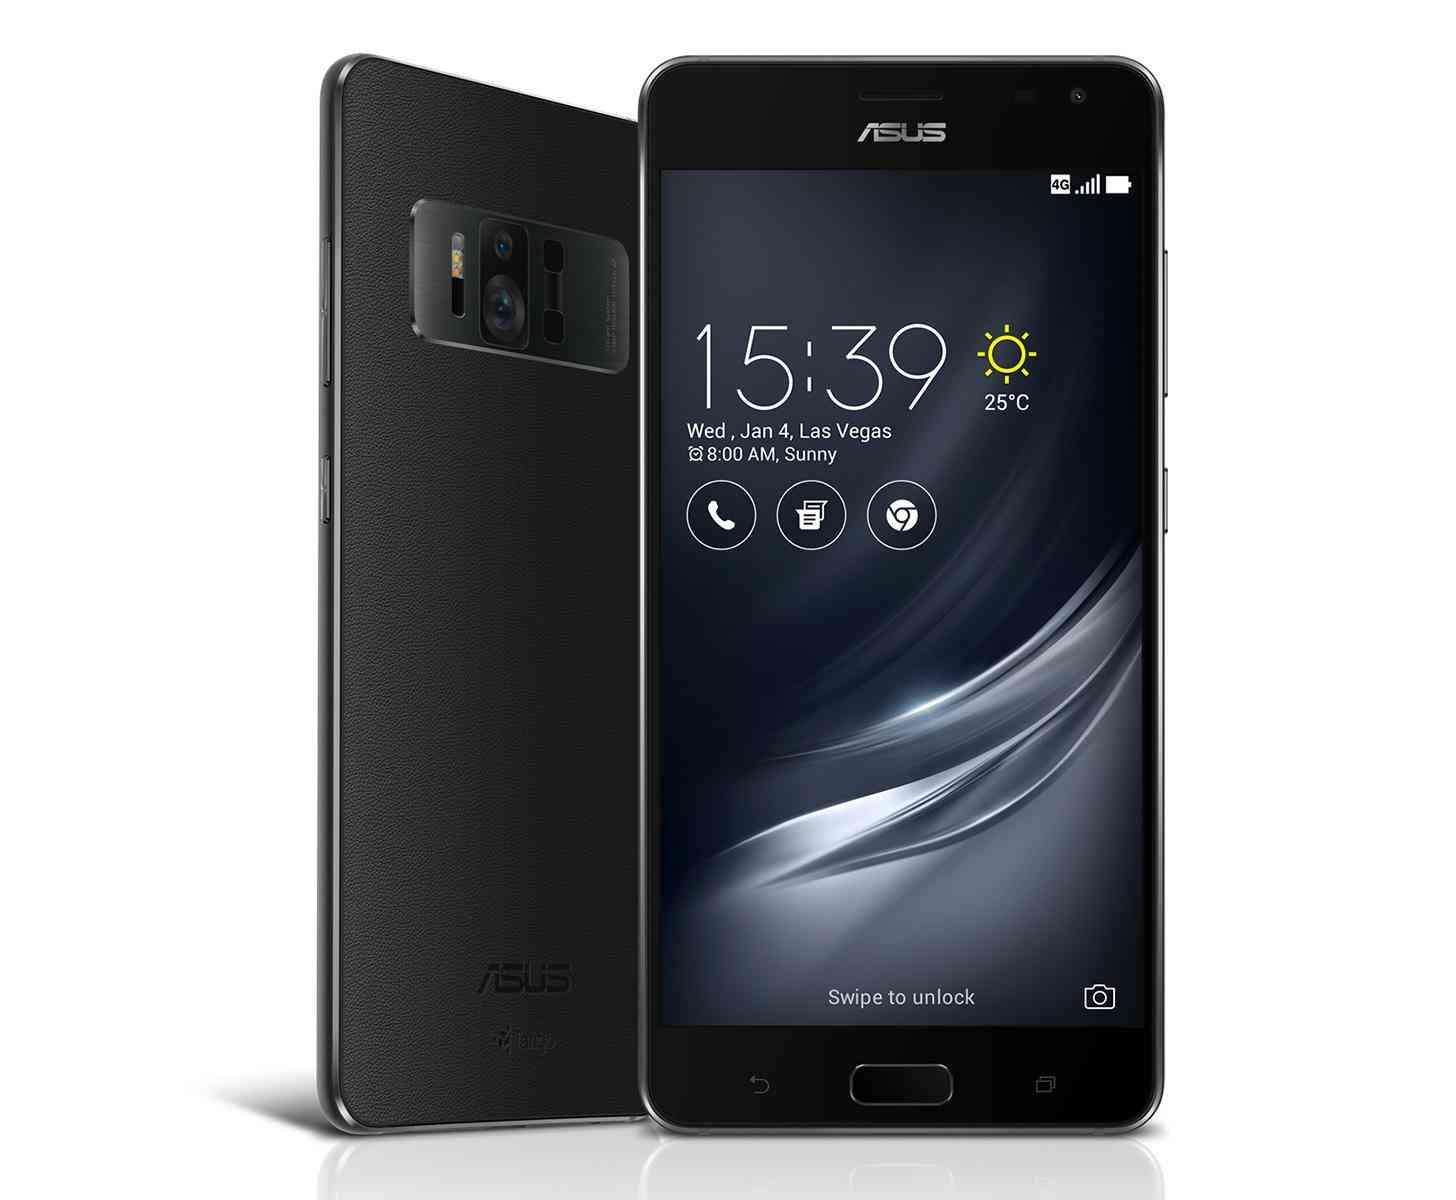 ASUS ZenFone AR official